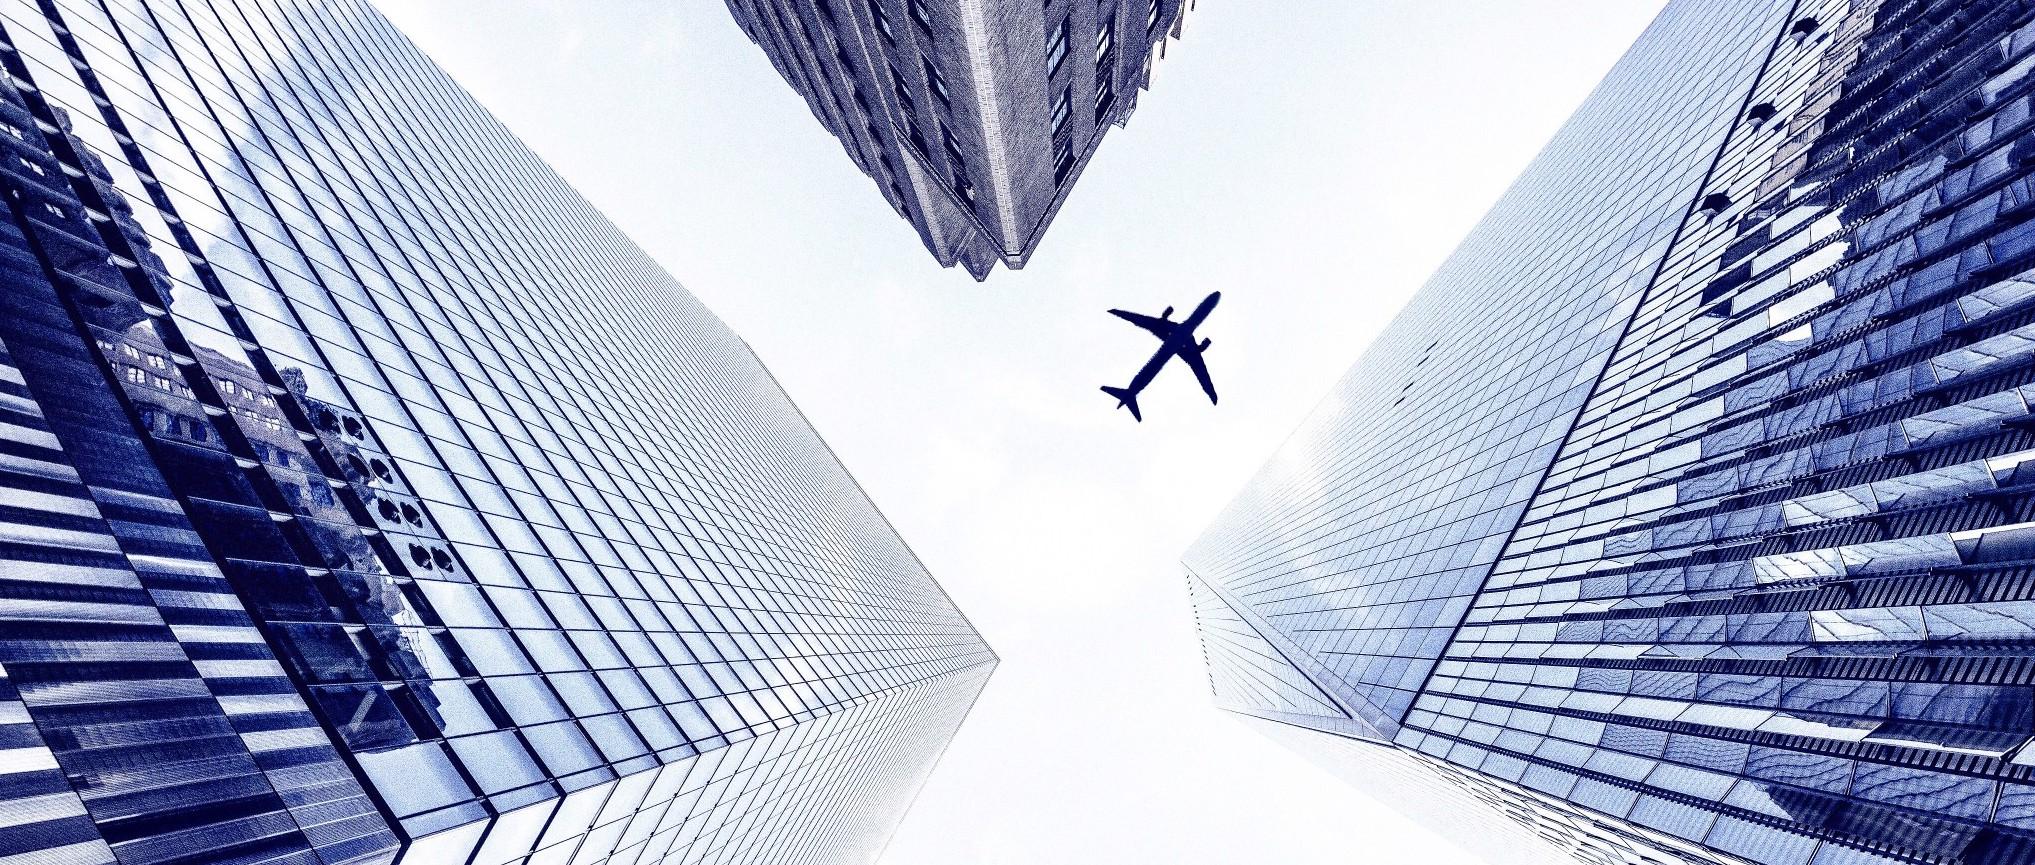 future of travel after coronavirus